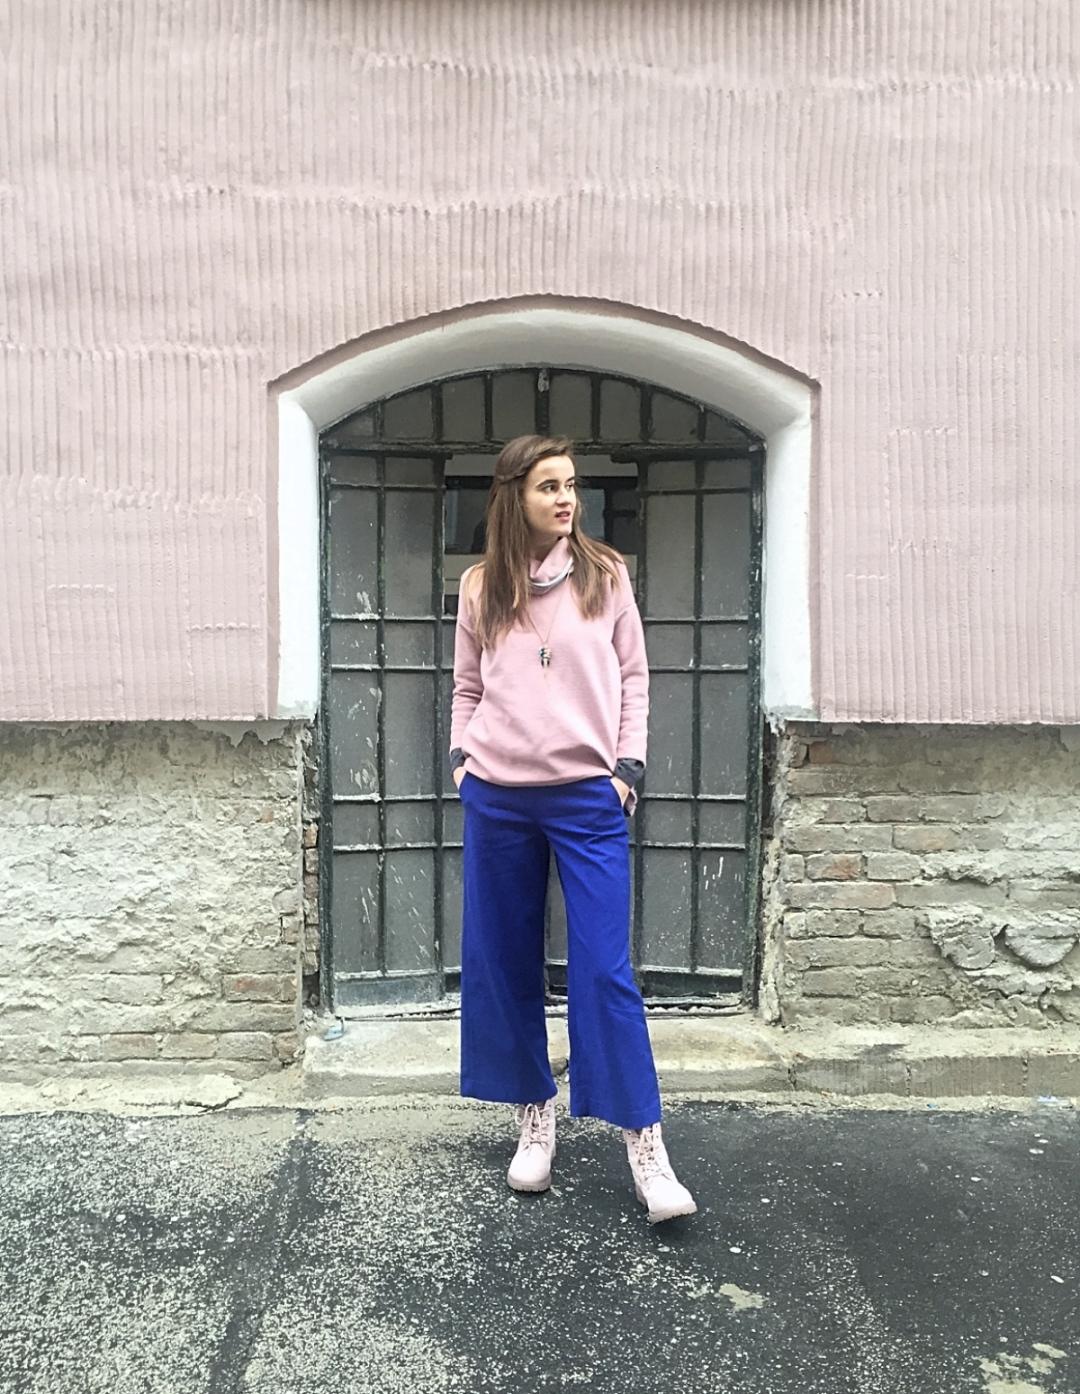 Bratislava fashion districs